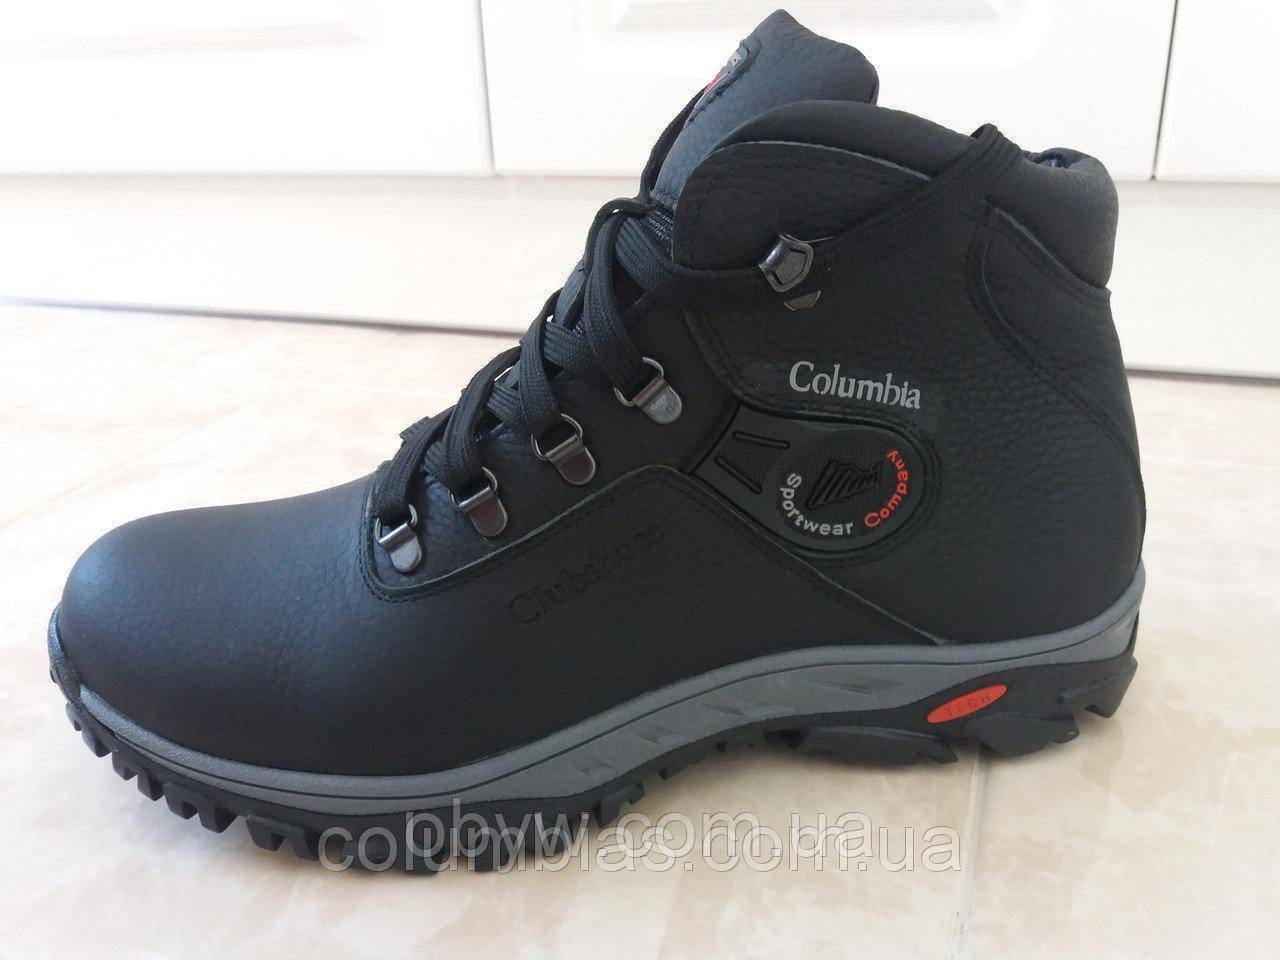 Акция! Кожаные тёплые мужские ботинки columbia ZX 79